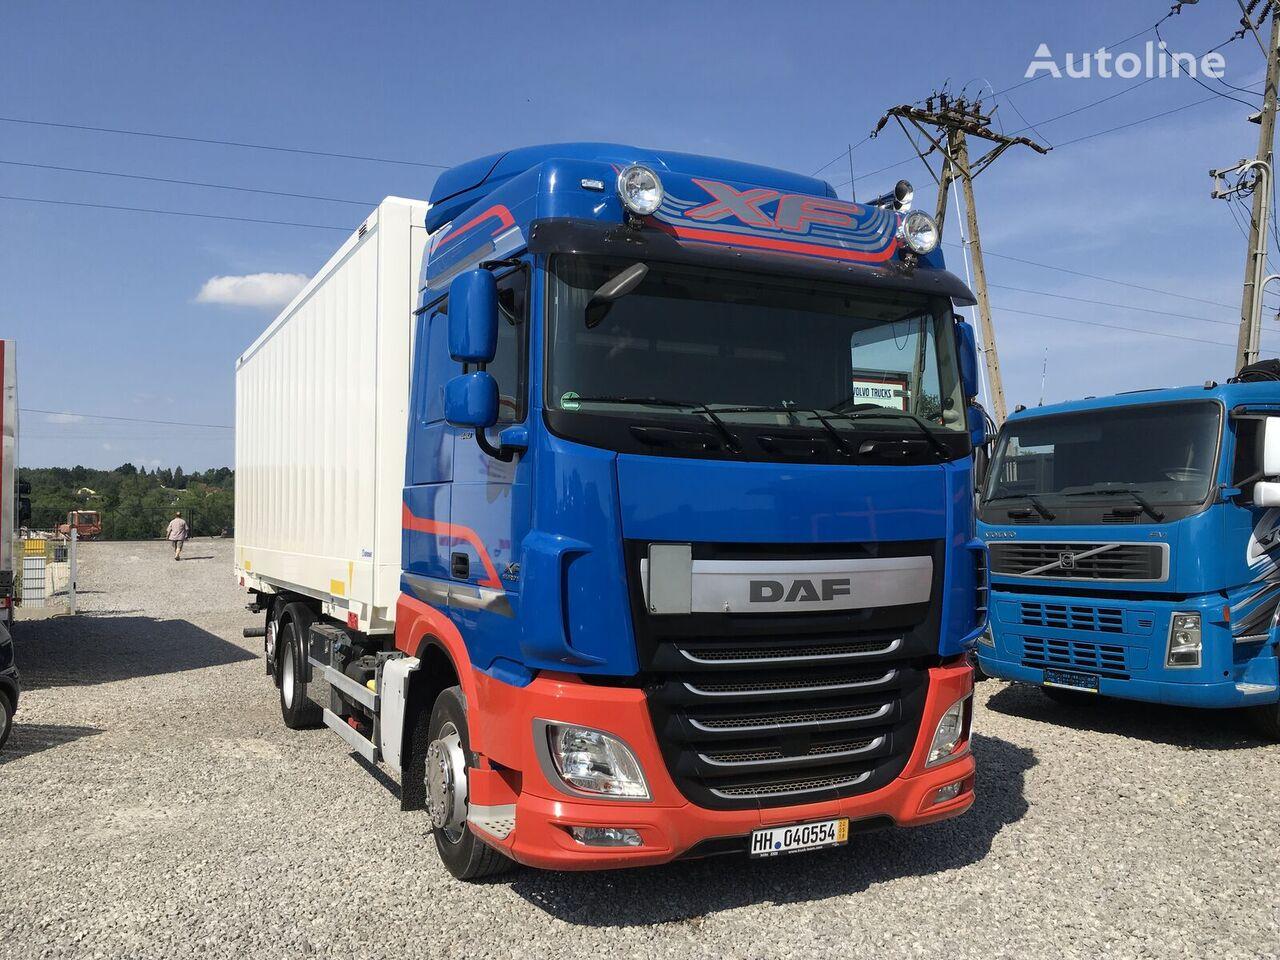 DAF XF 106.440 E6 105 kontener 6x2 , Super stan camión isotérmico